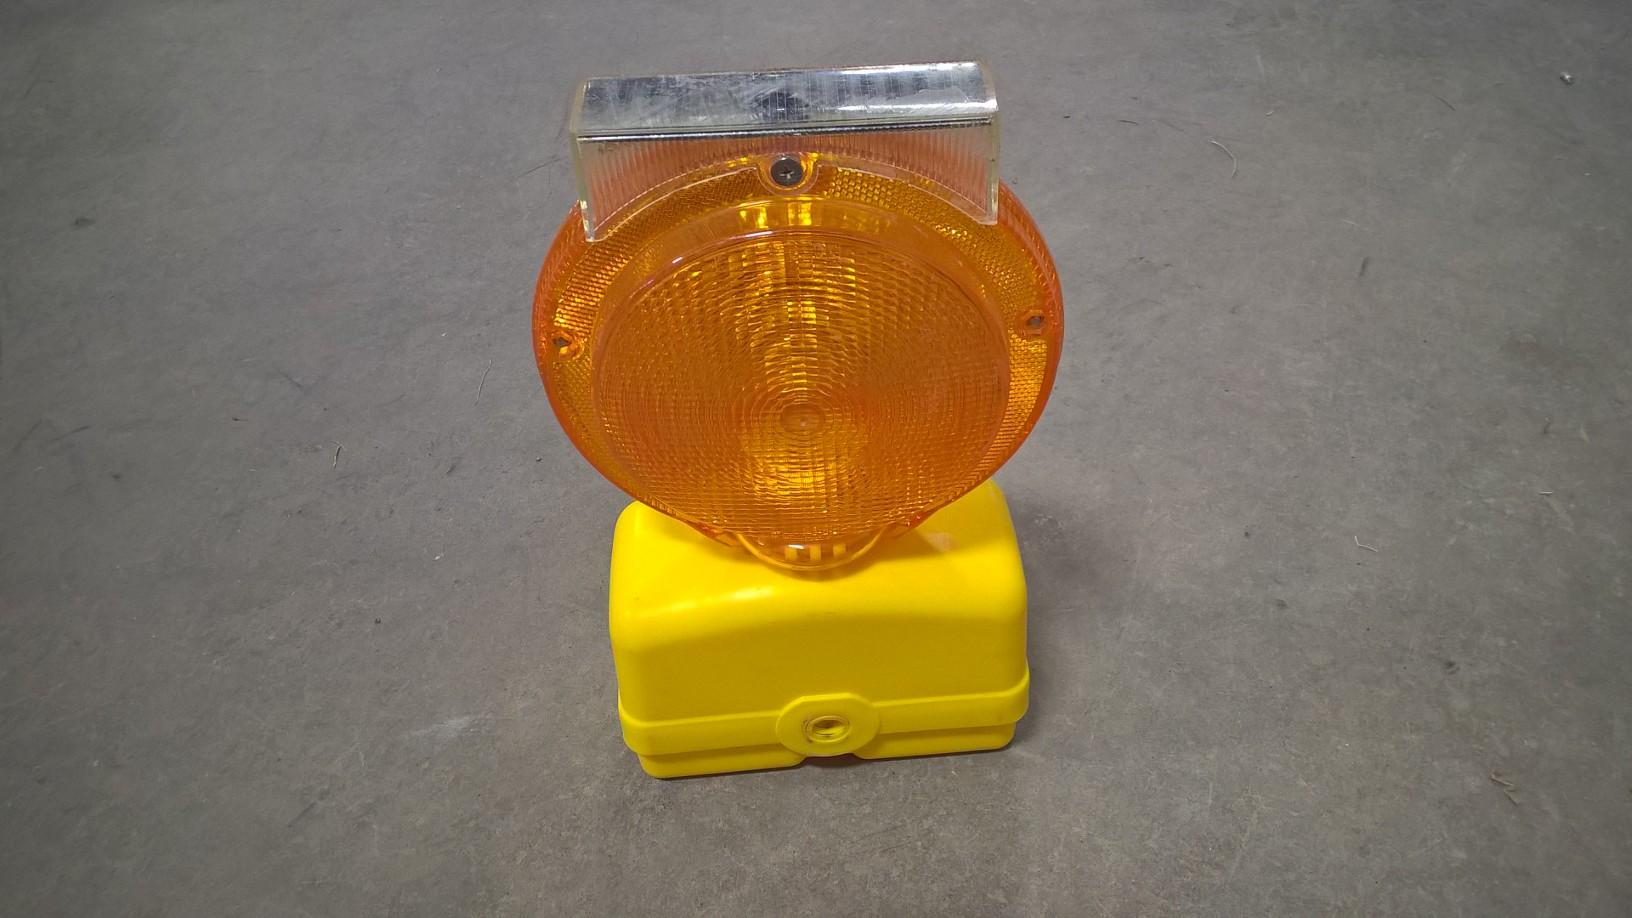 Flashing Barricade Light